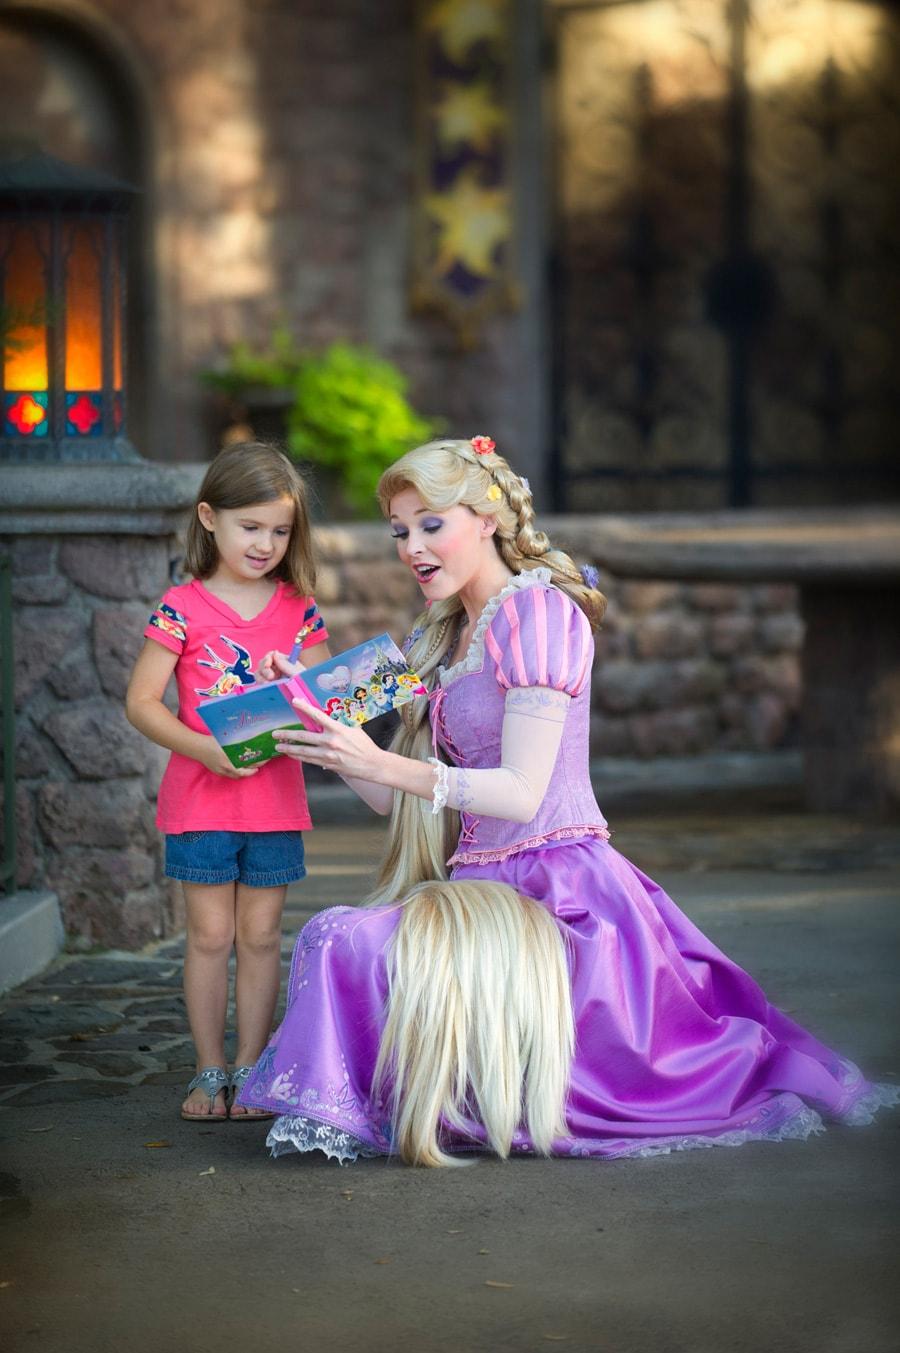 Two princesses meet at magic kingdom park disney parks blog ava meets rapunzel at magic kingdom park m4hsunfo